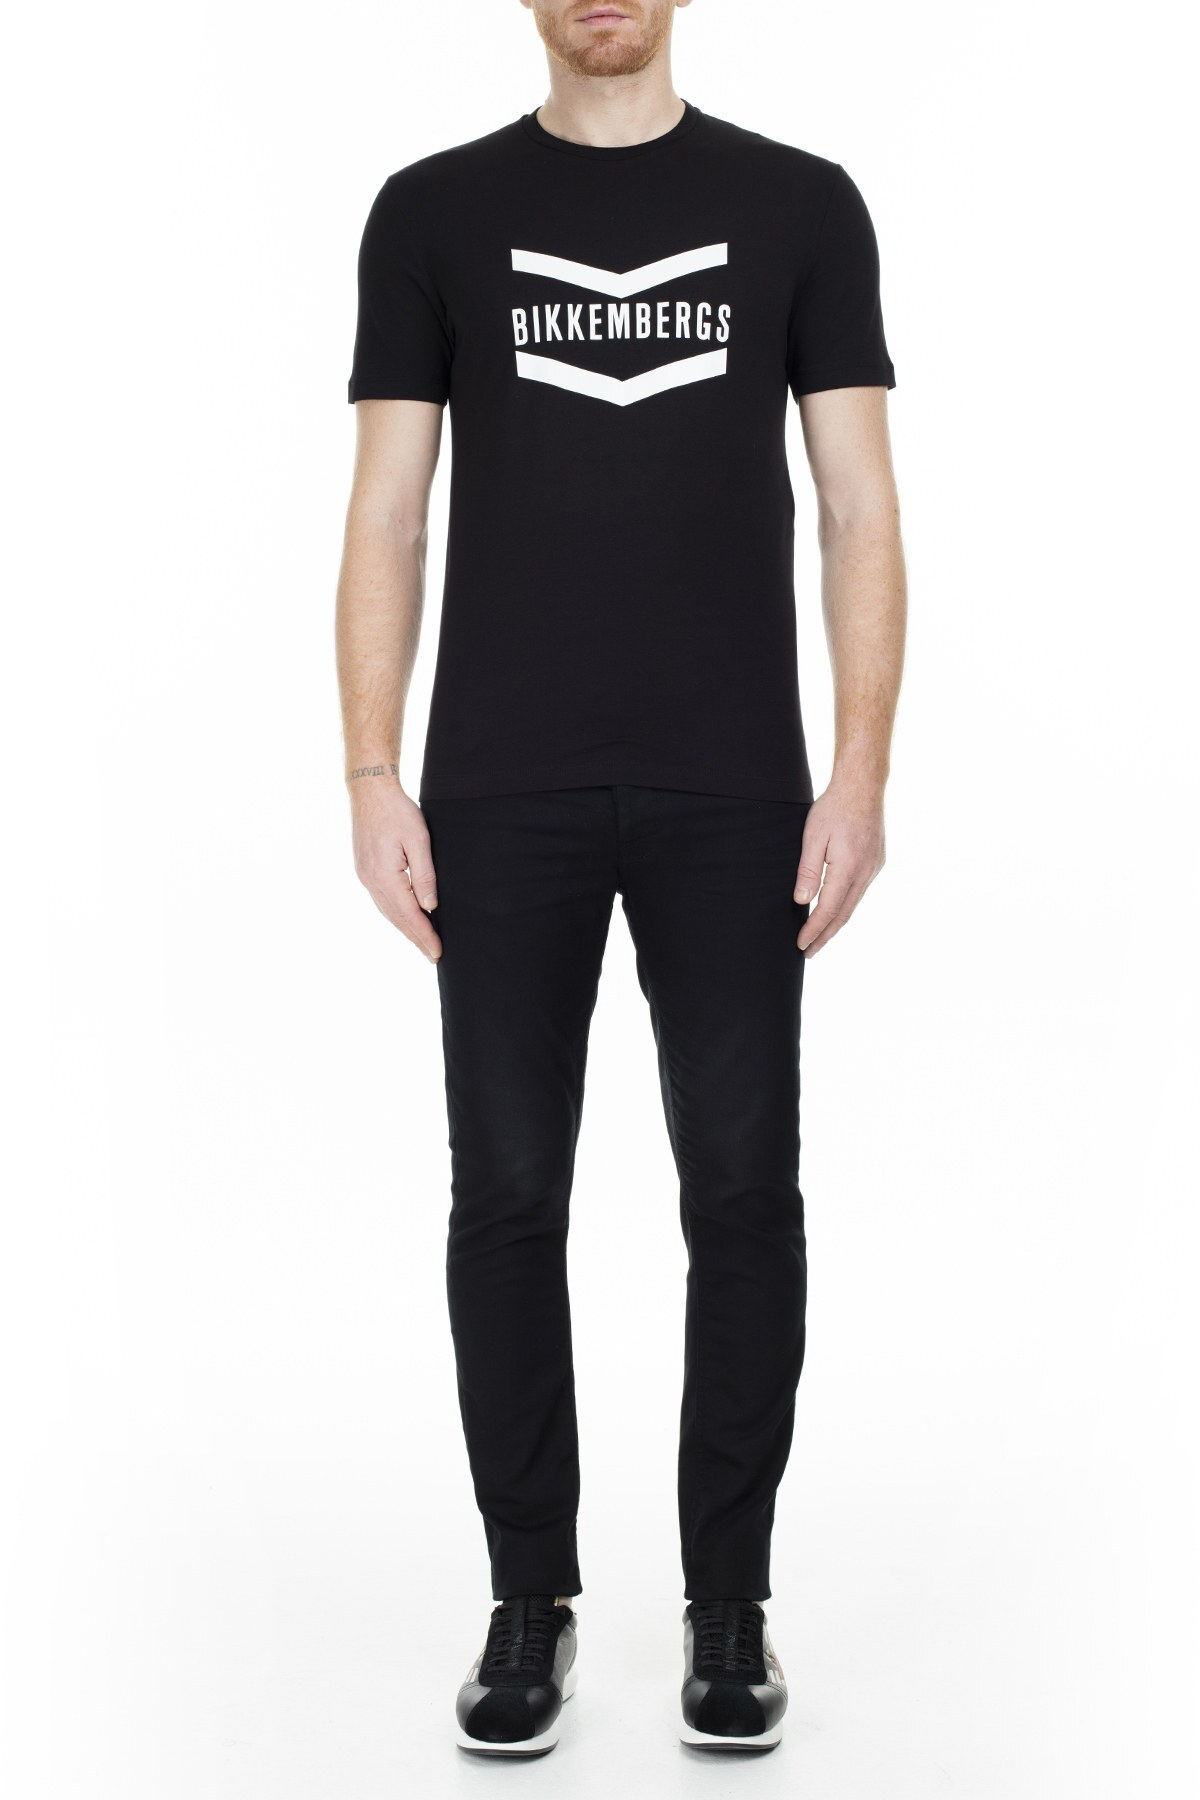 Bikkembergs Erkek T Shirt C700123E1823C74 SİYAH